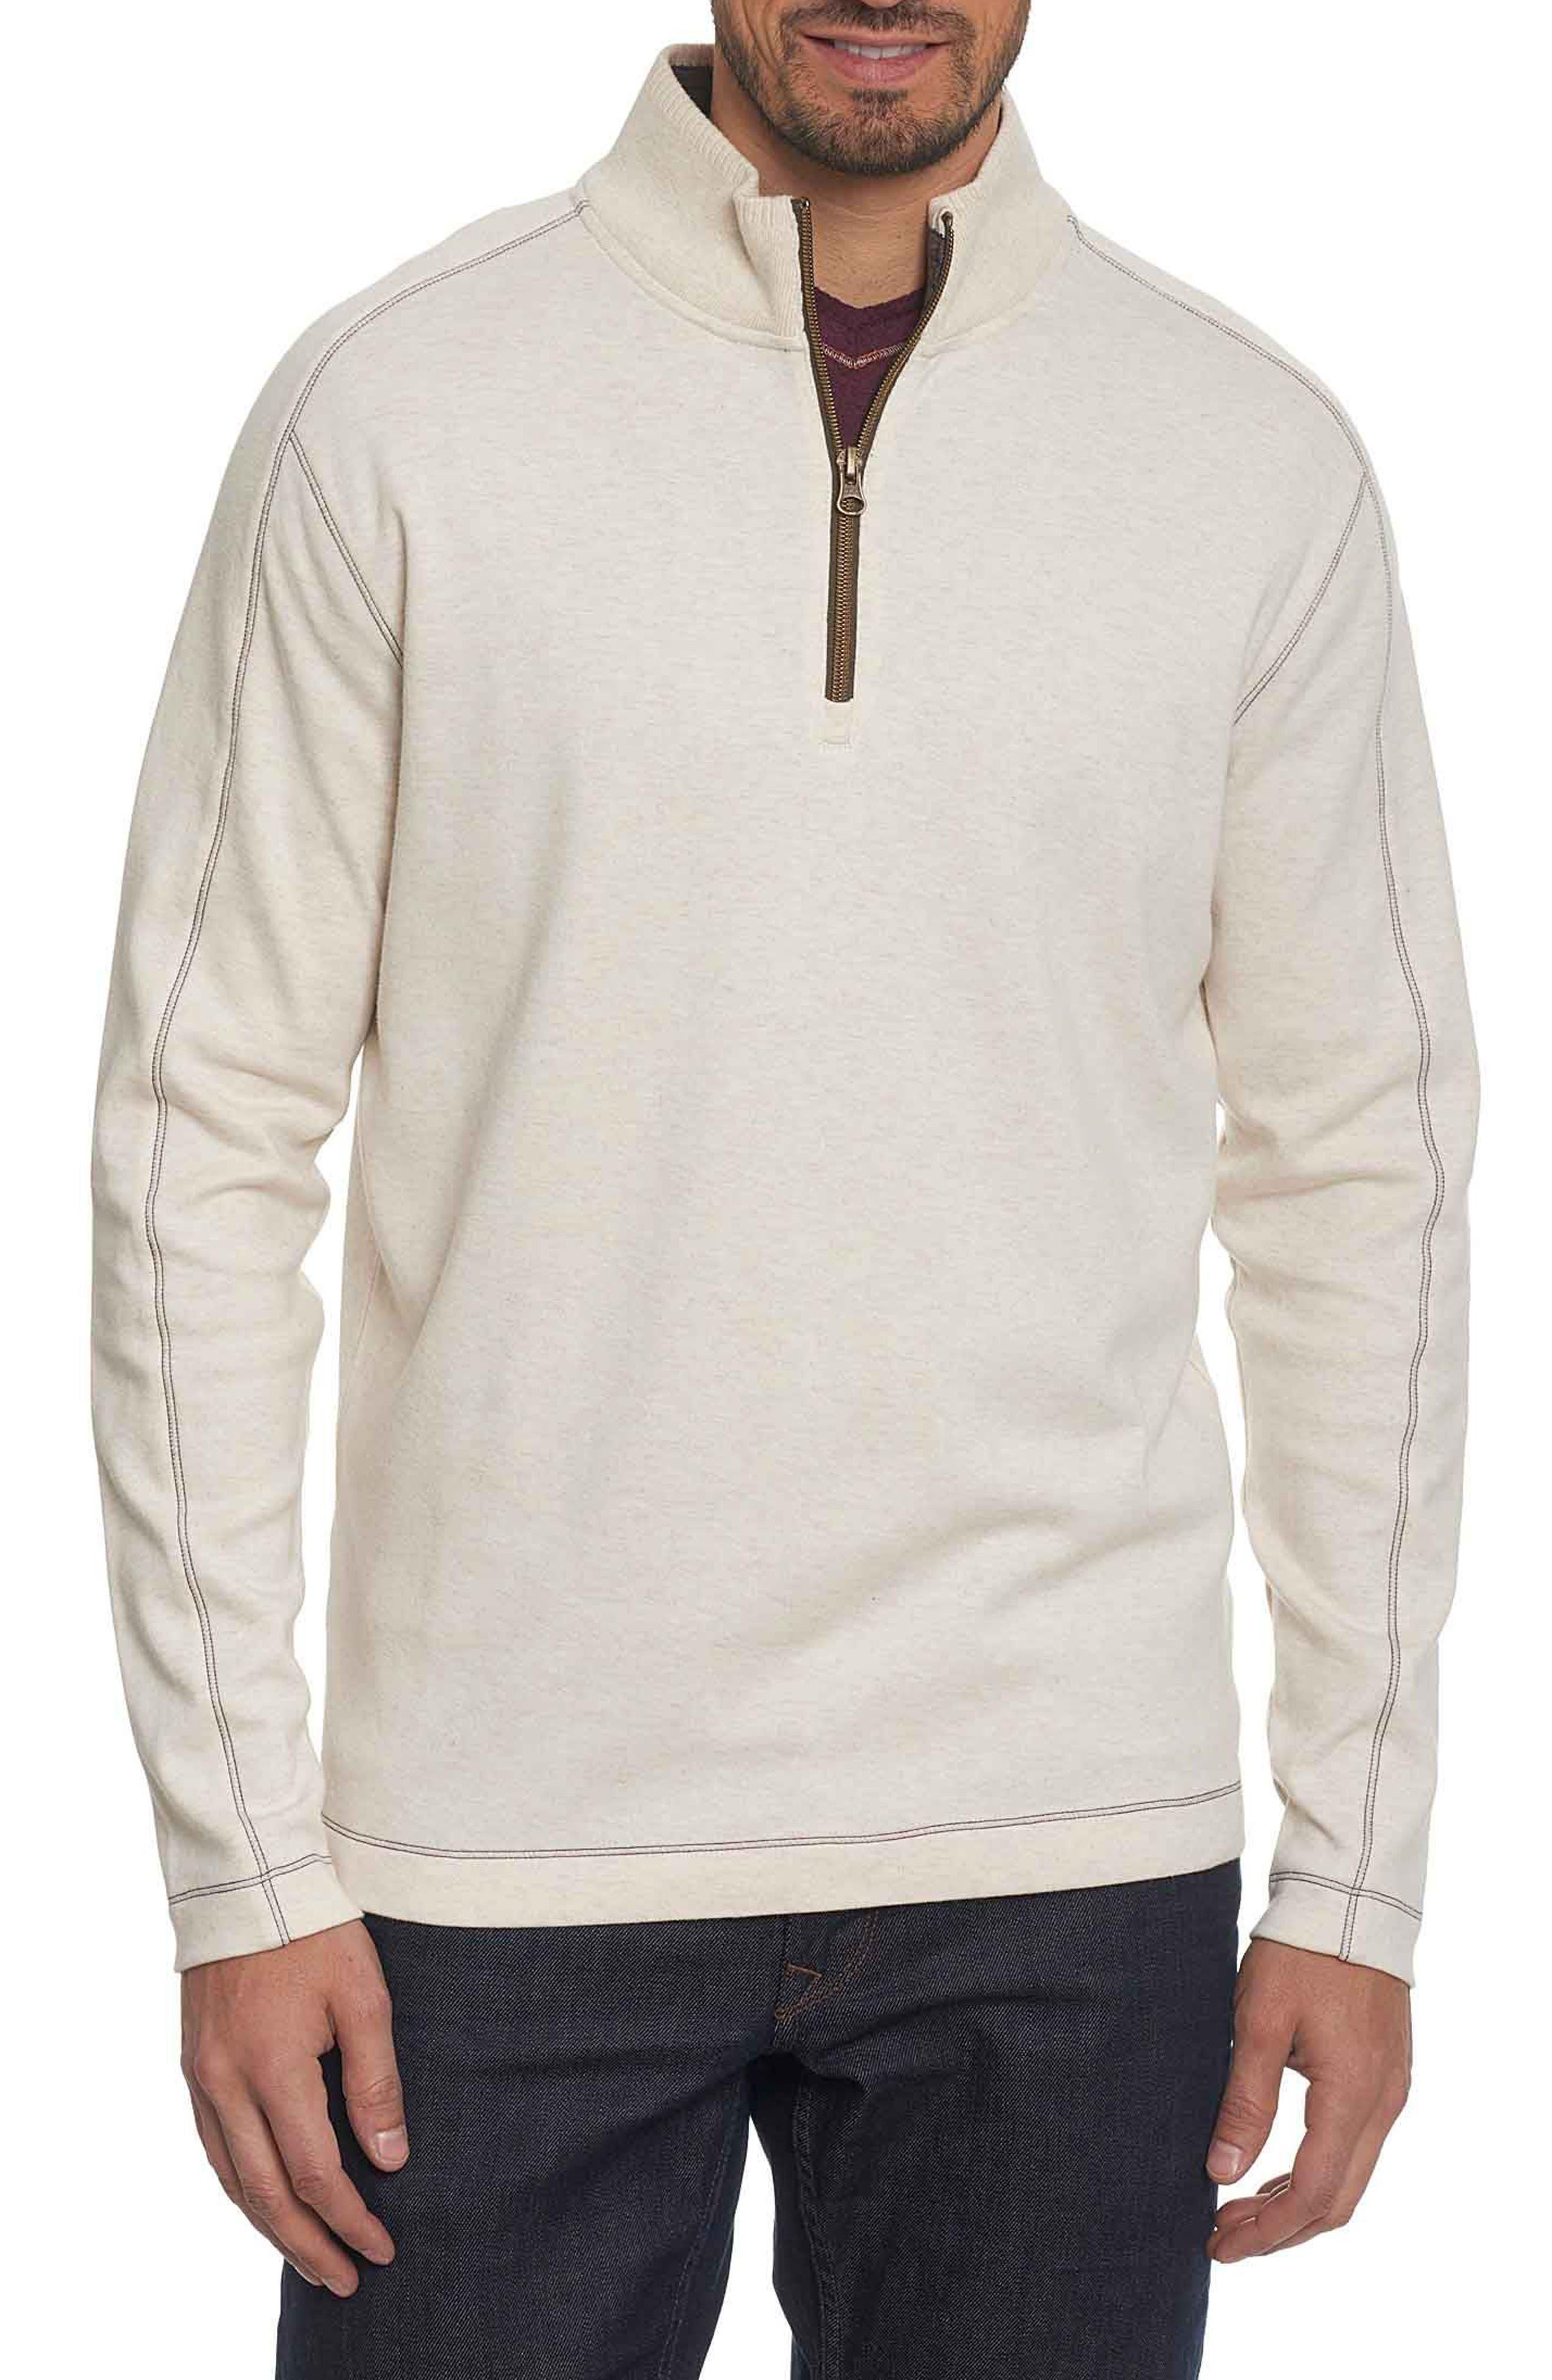 'Elia' Regular Fit Quarter Zip Pullover,                         Main,                         color, Heather White